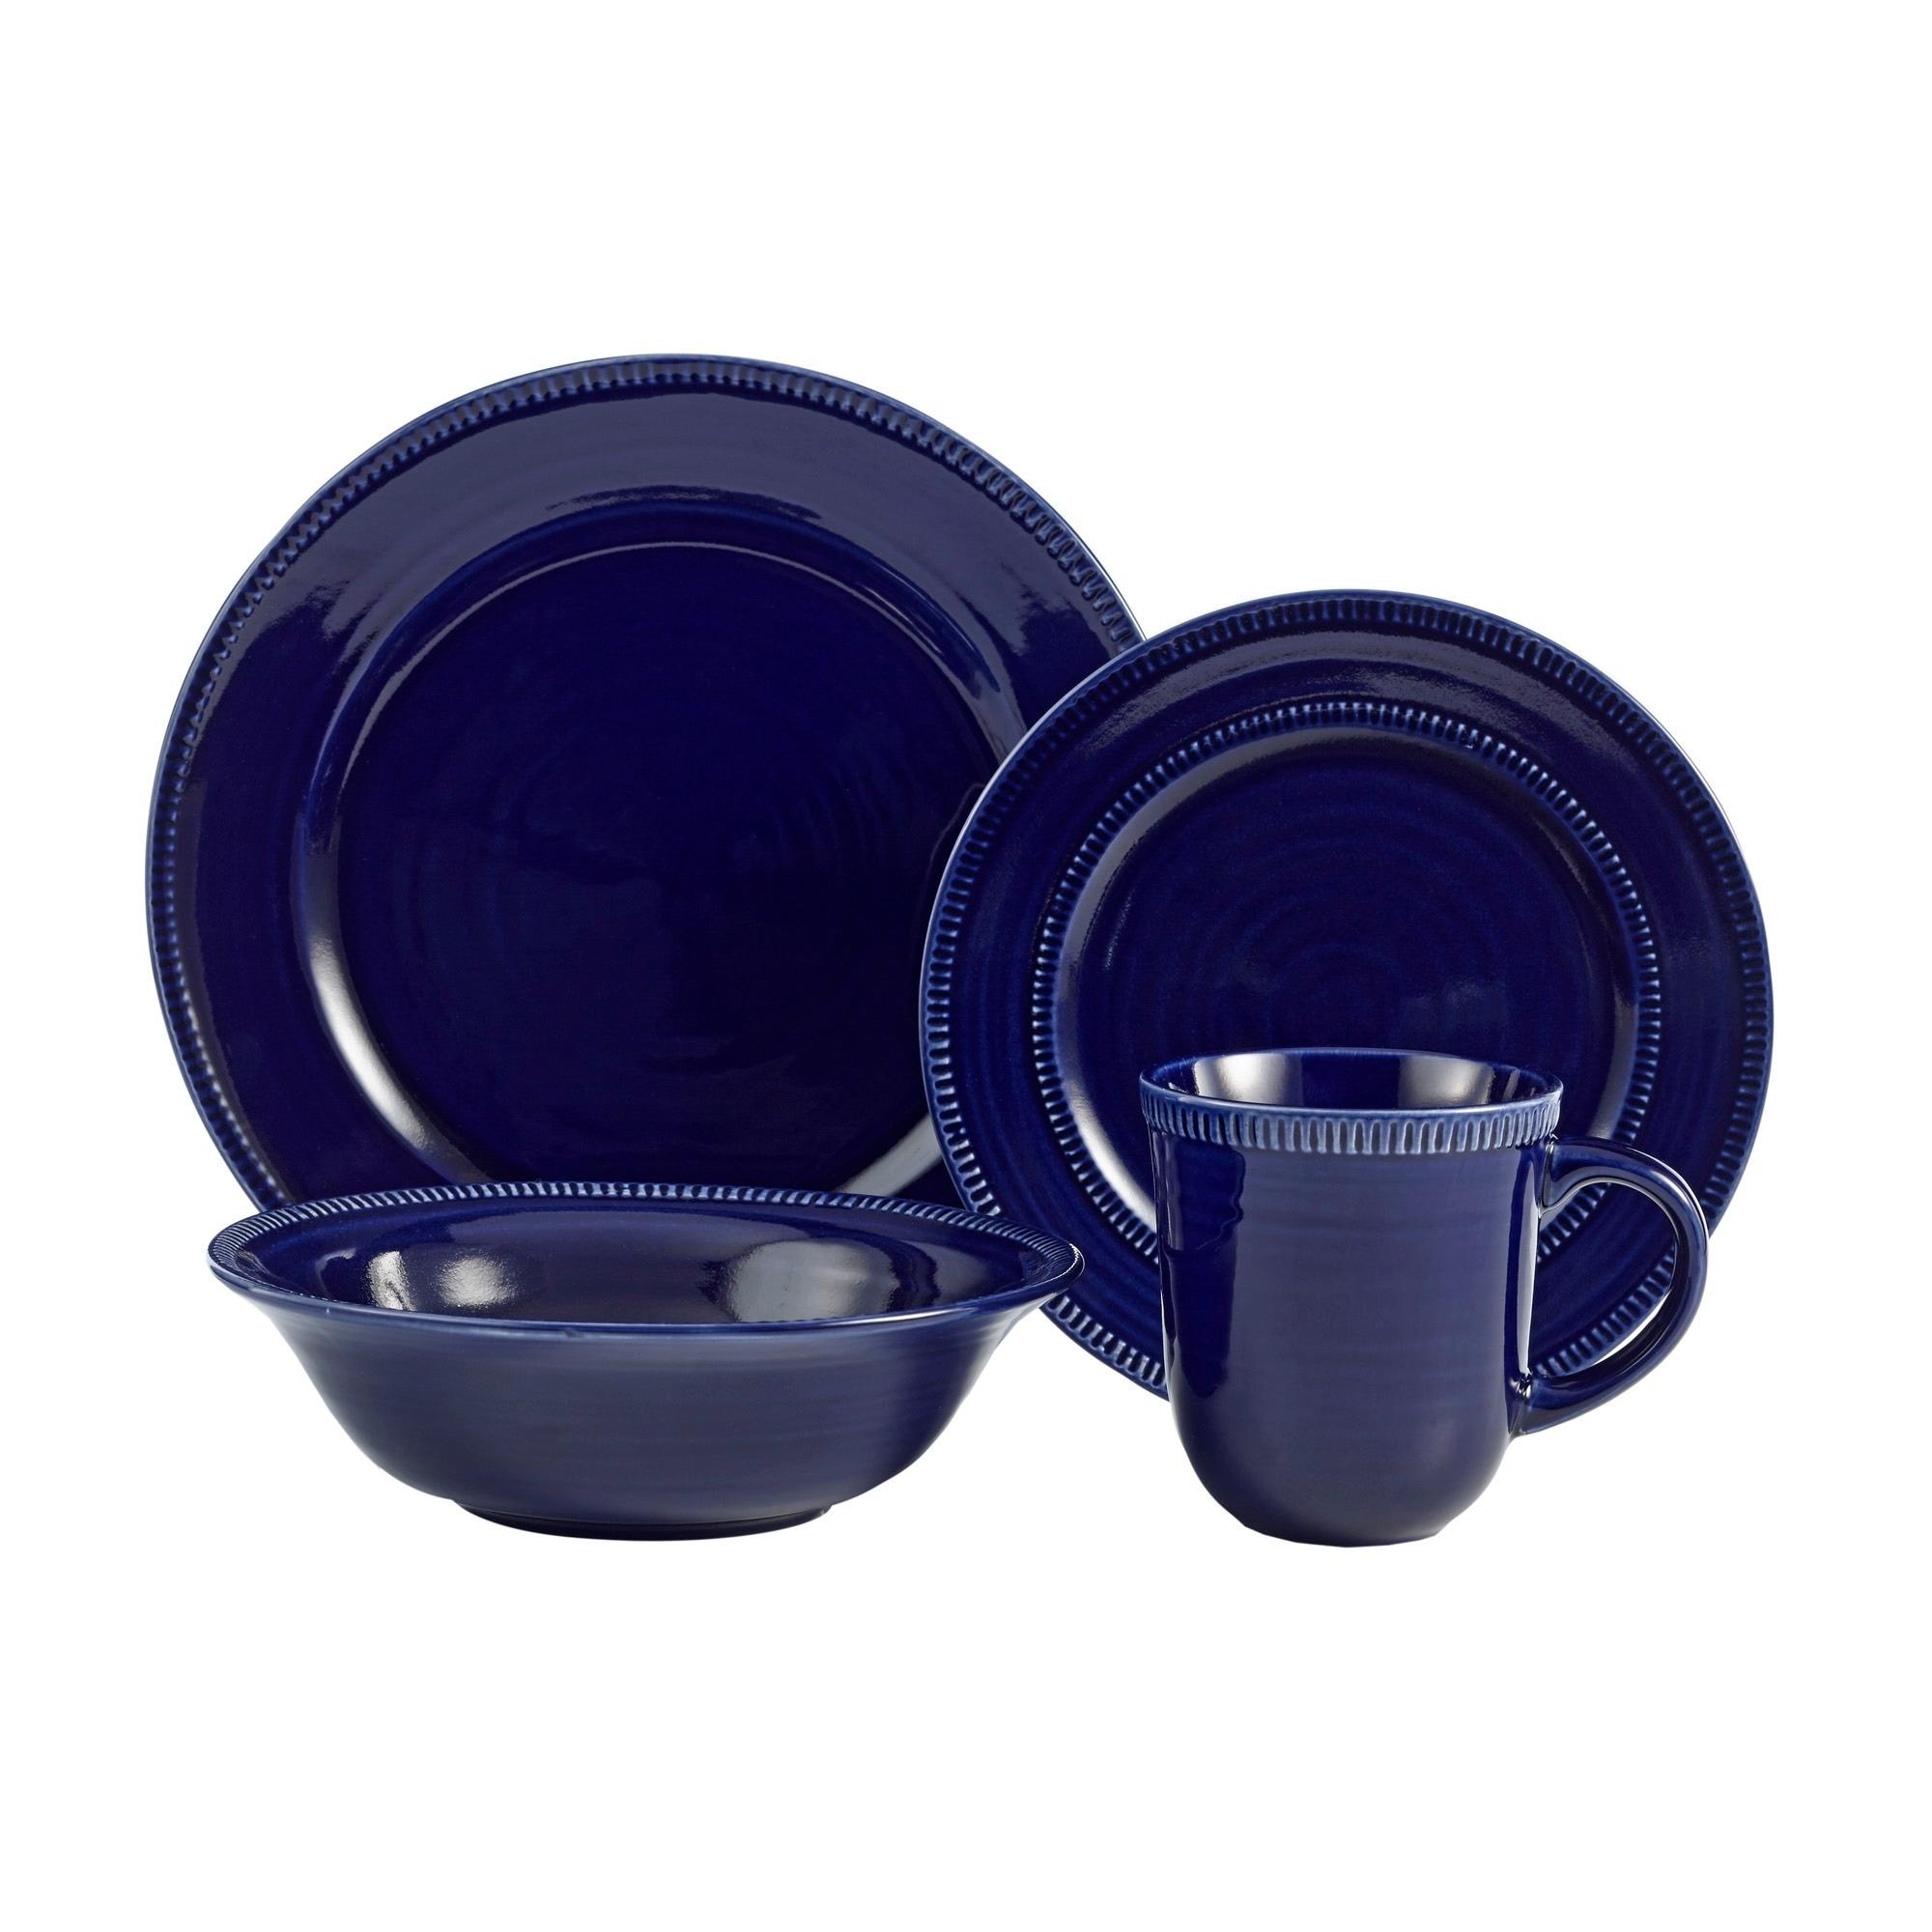 American Atelier Indigo 16-piece Dinnerware Set - Free Shipping Today - Overstock - 21077241  sc 1 st  Overstock.com & American Atelier Indigo 16-piece Dinnerware Set - Free Shipping ...